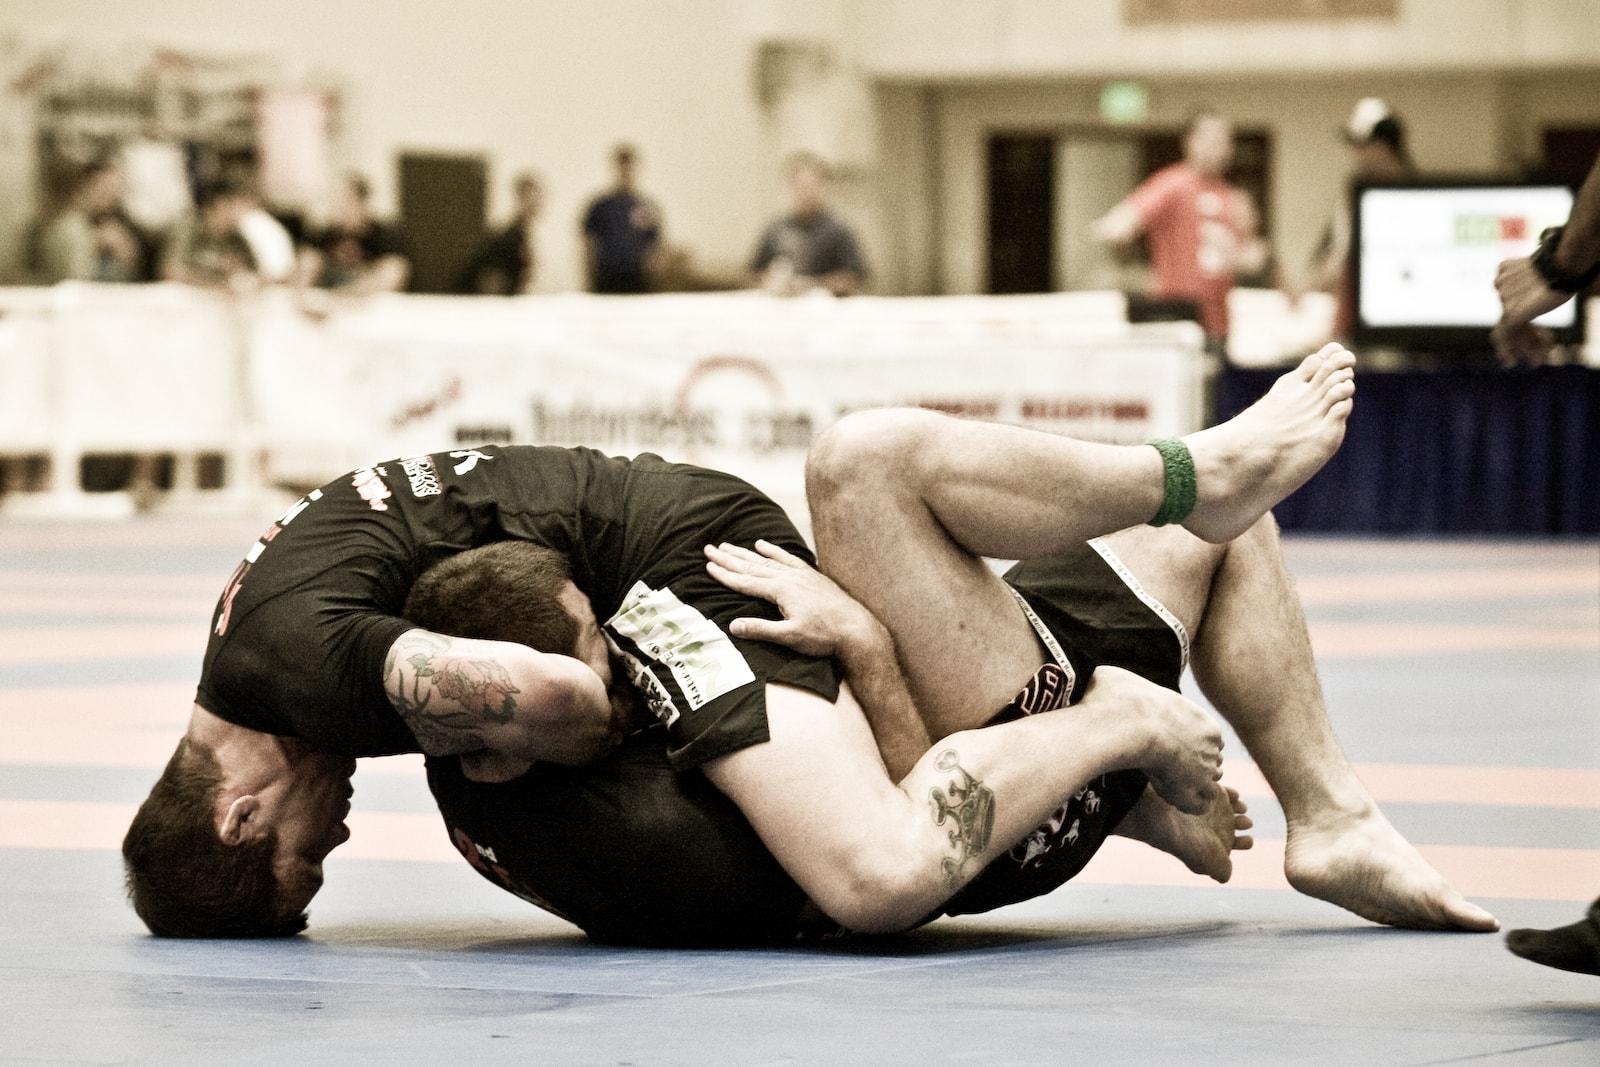 La Guía del Brazilian Jiu-Jitsu - Popularidad